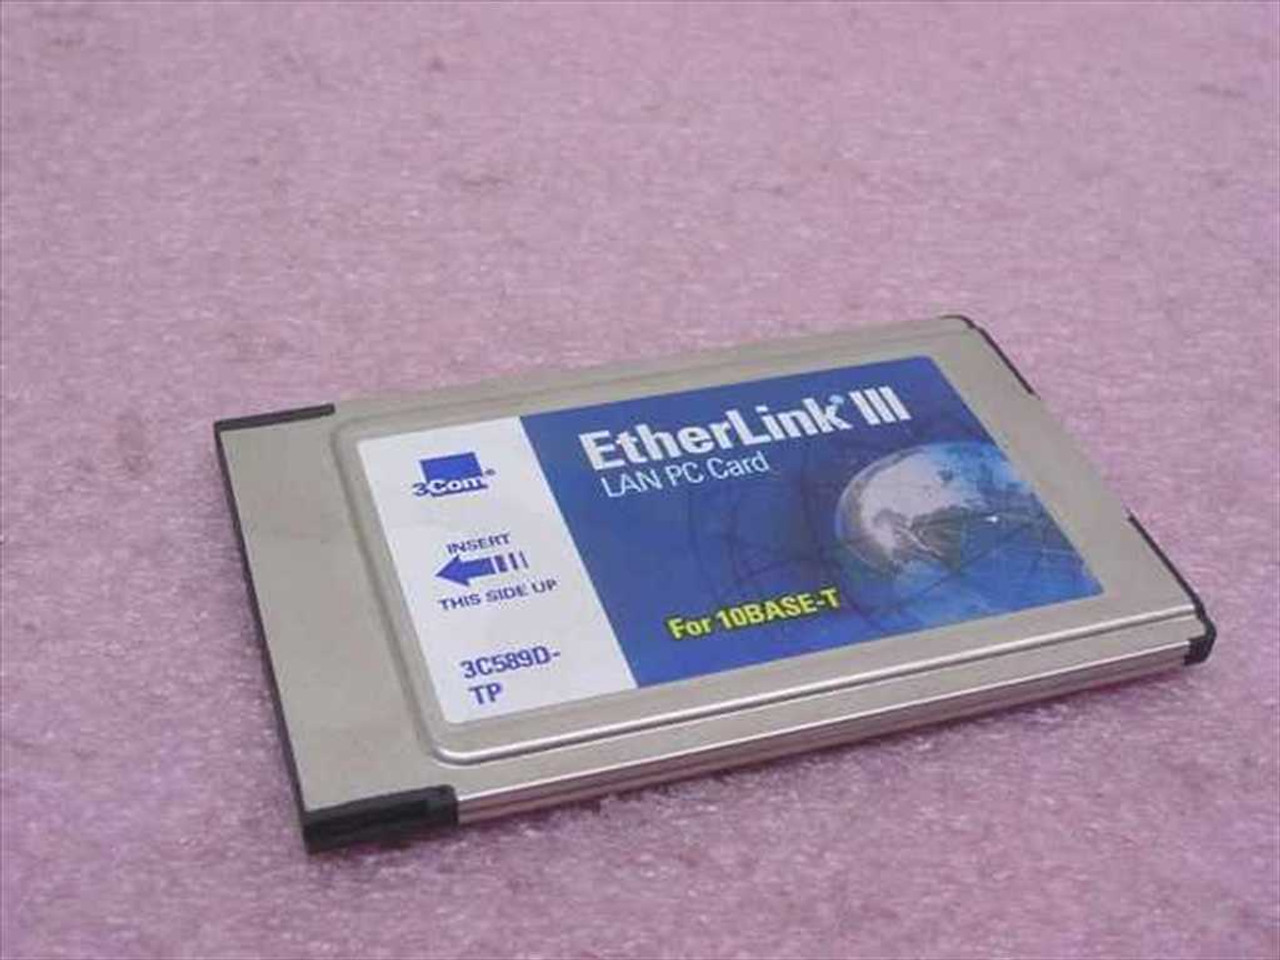 3COM ETHERLINK III 3C589D-TP WINDOWS 7 X64 DRIVER DOWNLOAD